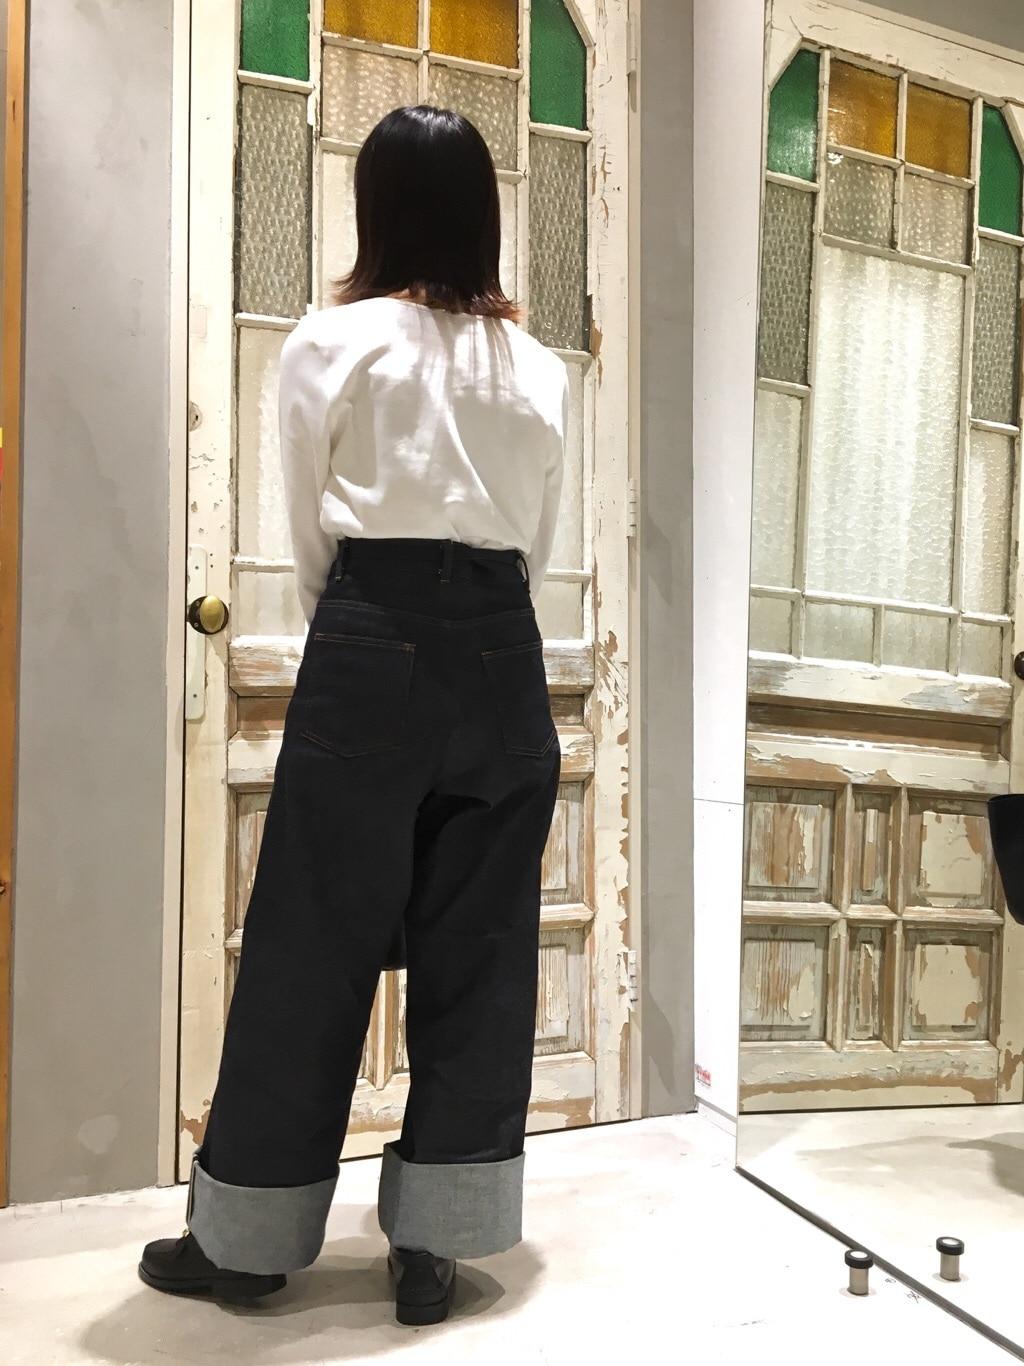 bulle de savon 中目黒路面 身長:153cm 2019.08.29